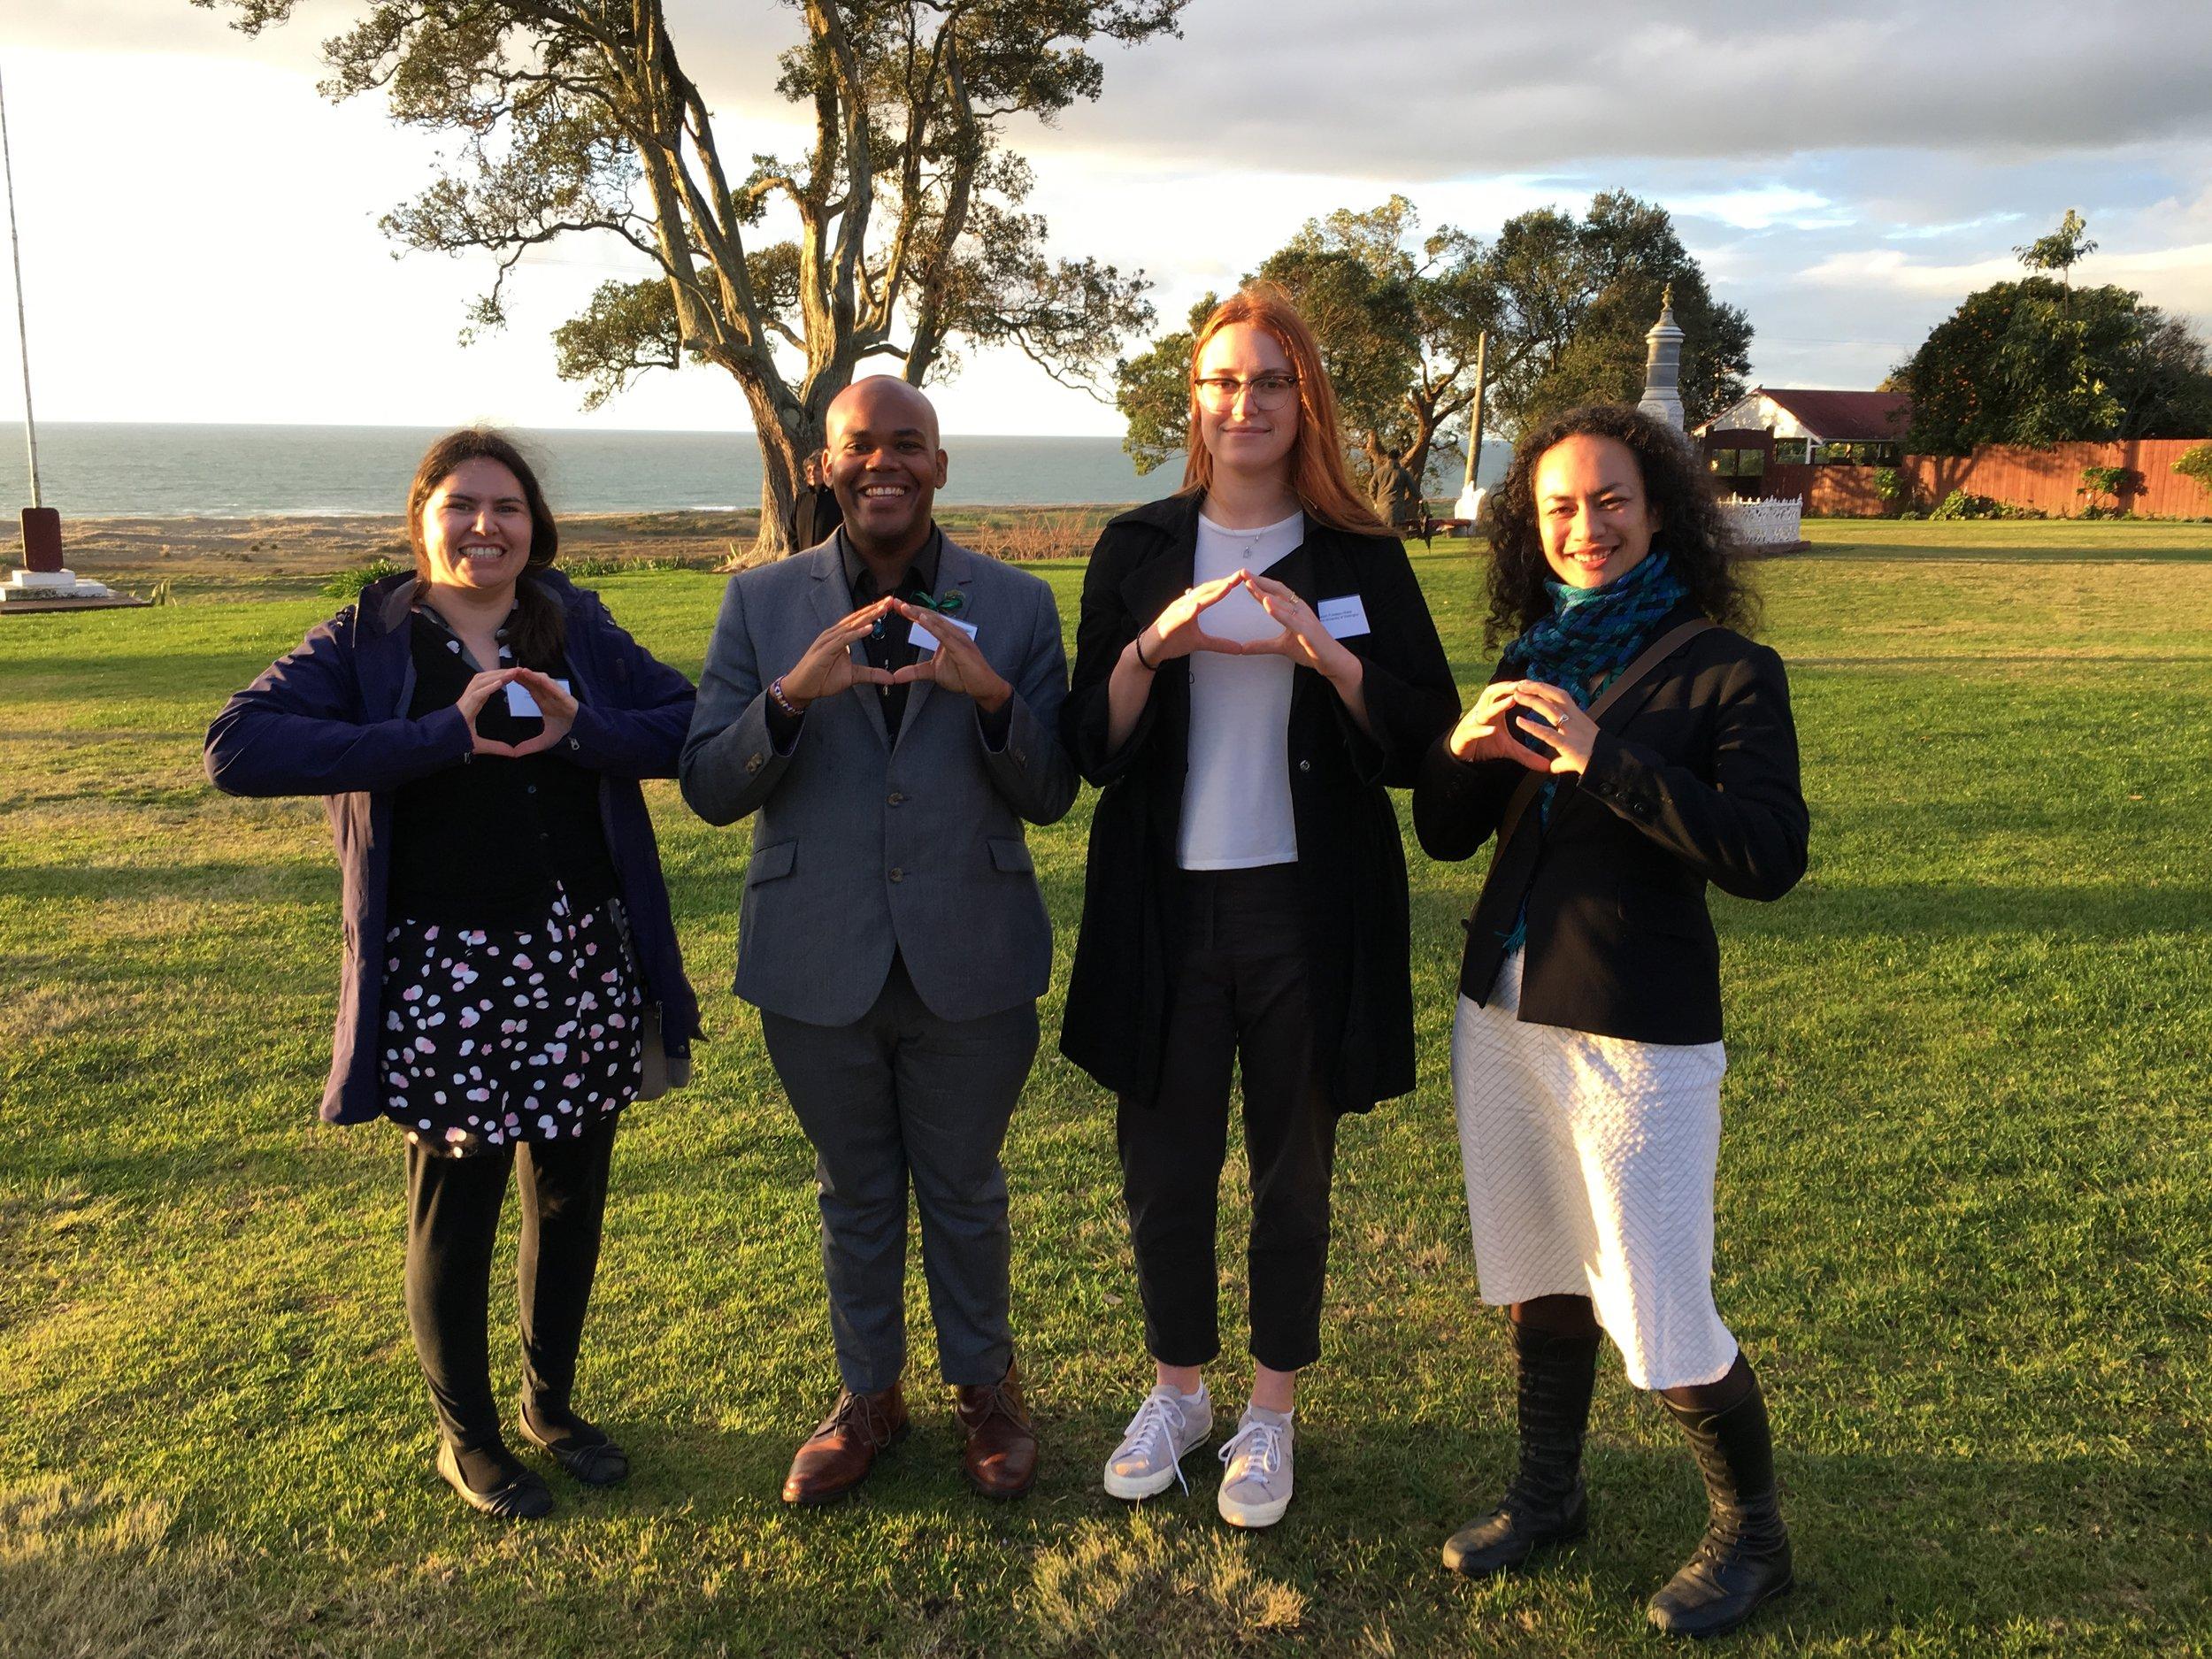 Victoria Univ. Wellington, 21 Aug 2019#The Moana Project launches from Ōpōtiki